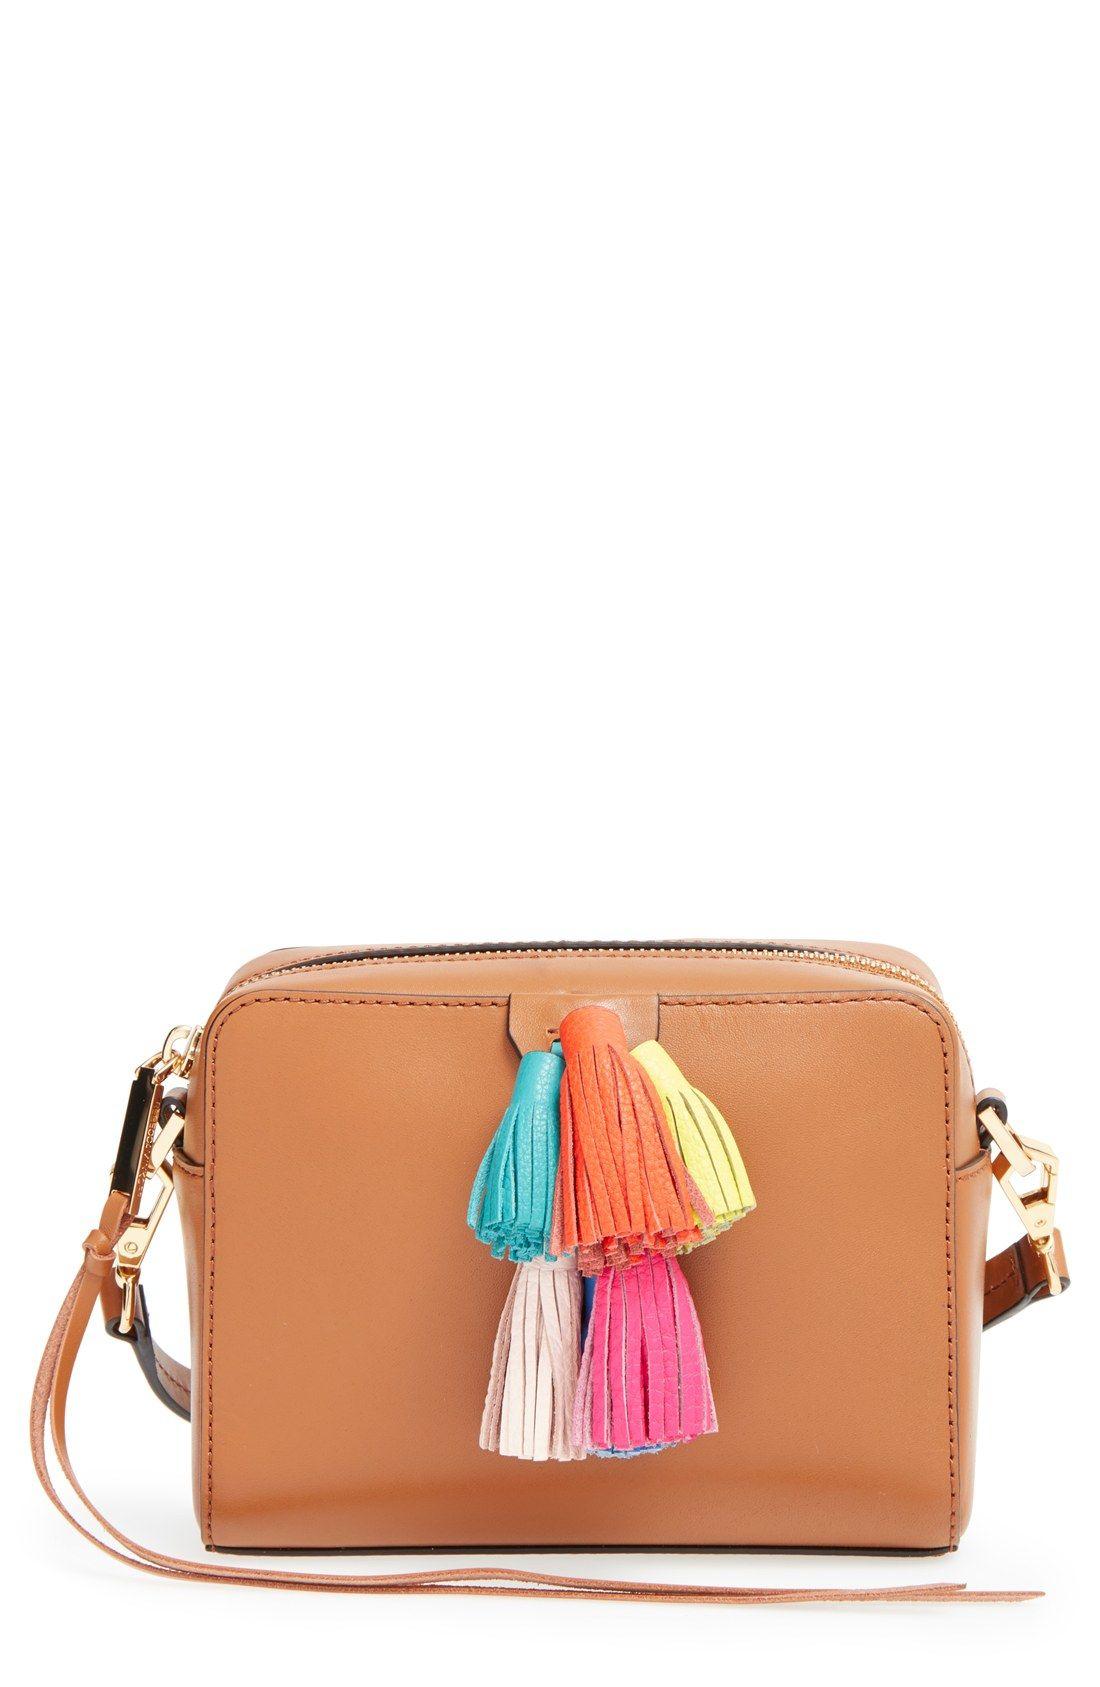 Rebecca Minkoff 'Mini Sofia' Crossbody Bag | Nordstrom